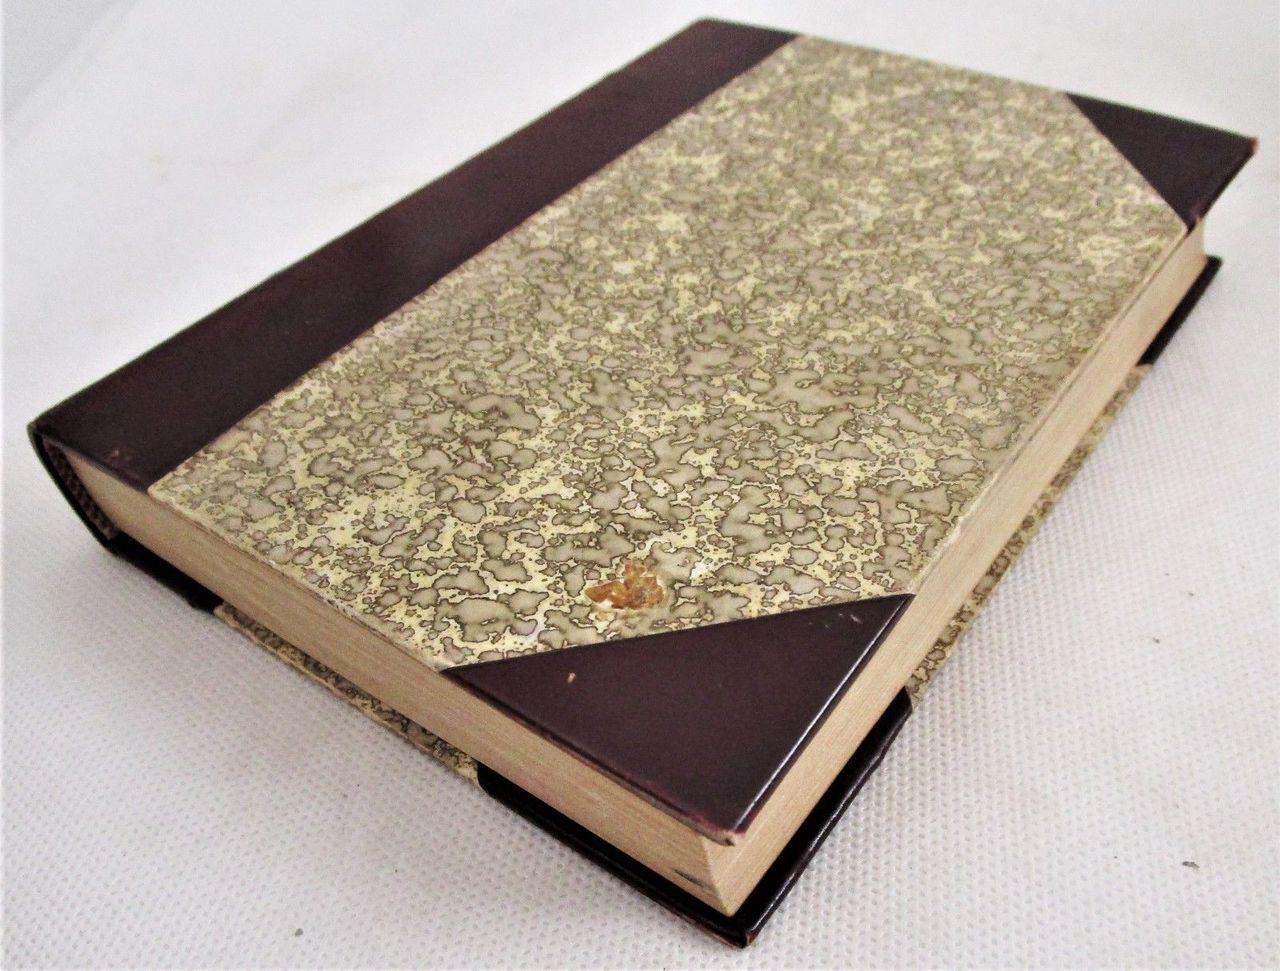 FIVE NOVELS BY JANE AUSTEN - 1888 [5 Vols] Leatherbound Stokes Pride & Prejudice